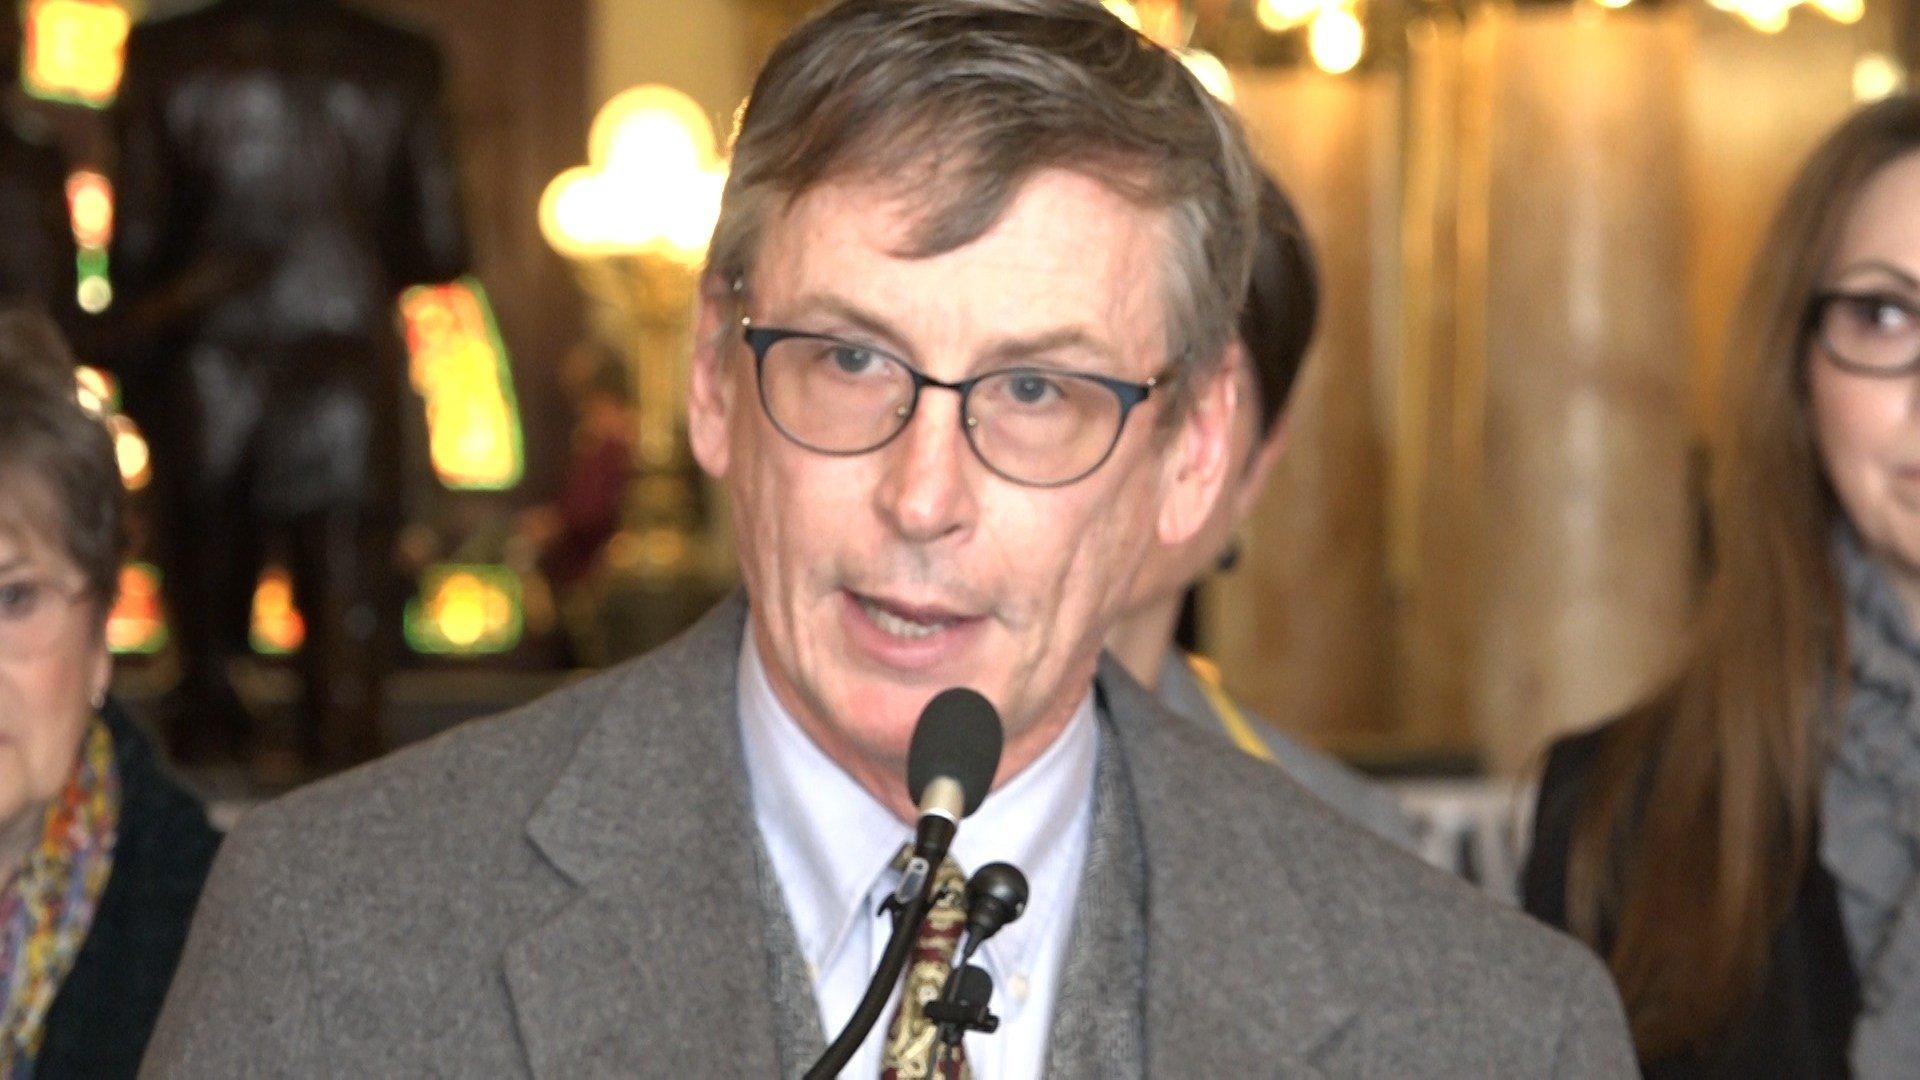 MT Rep. Tom Woods, D-Bozeman